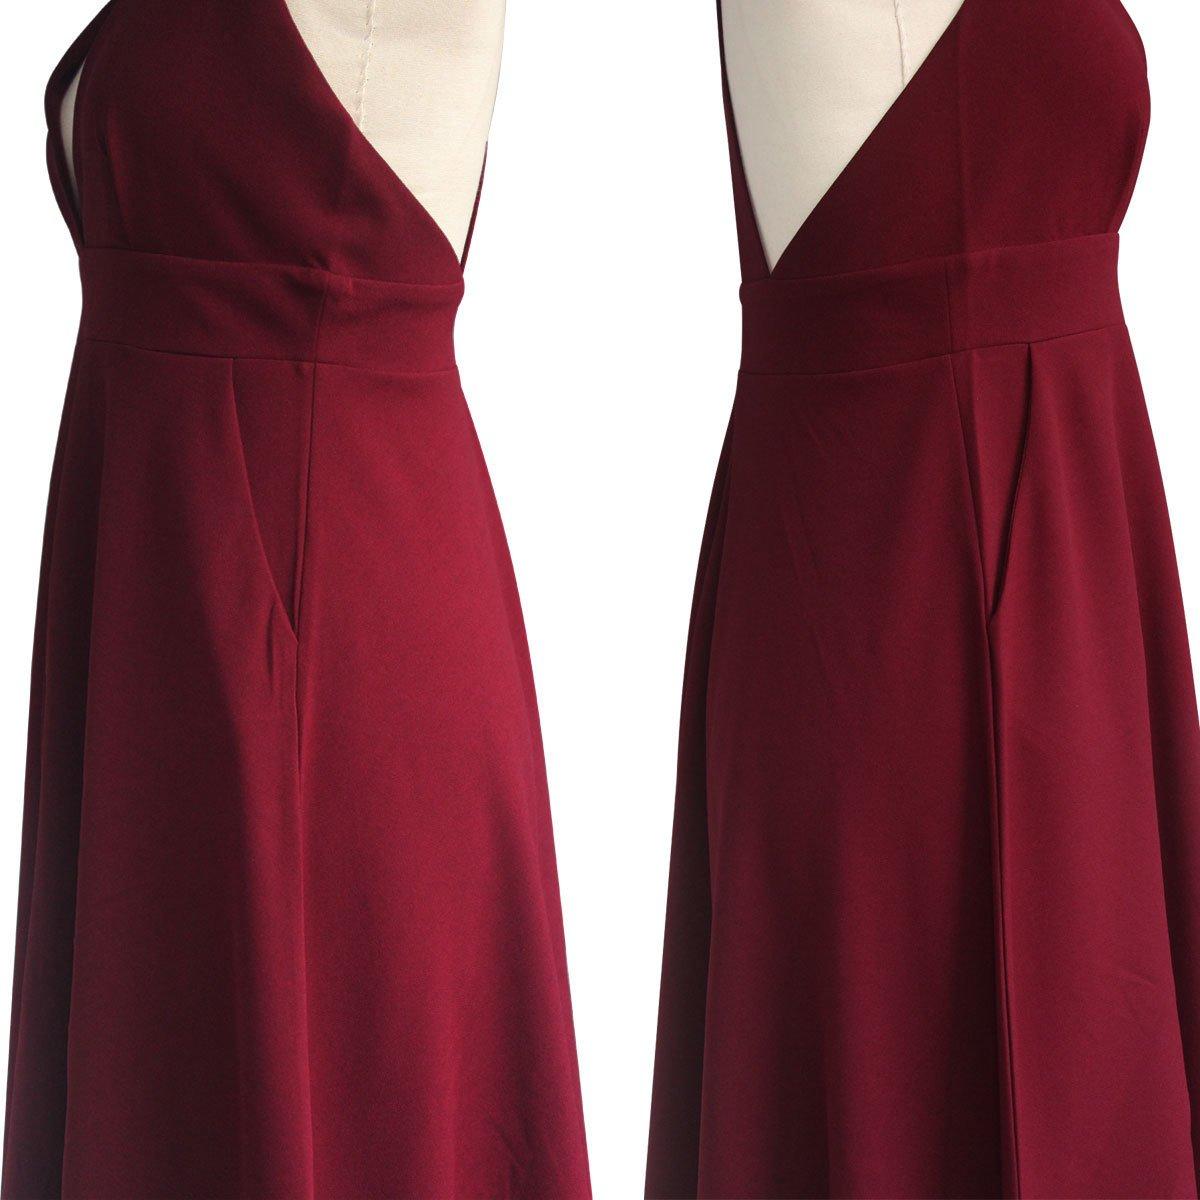 Summer Women's A-Line Sleeveless Deep V-Neck MIDI Dress (M, Burgandy) by YOOHOG (Image #8)